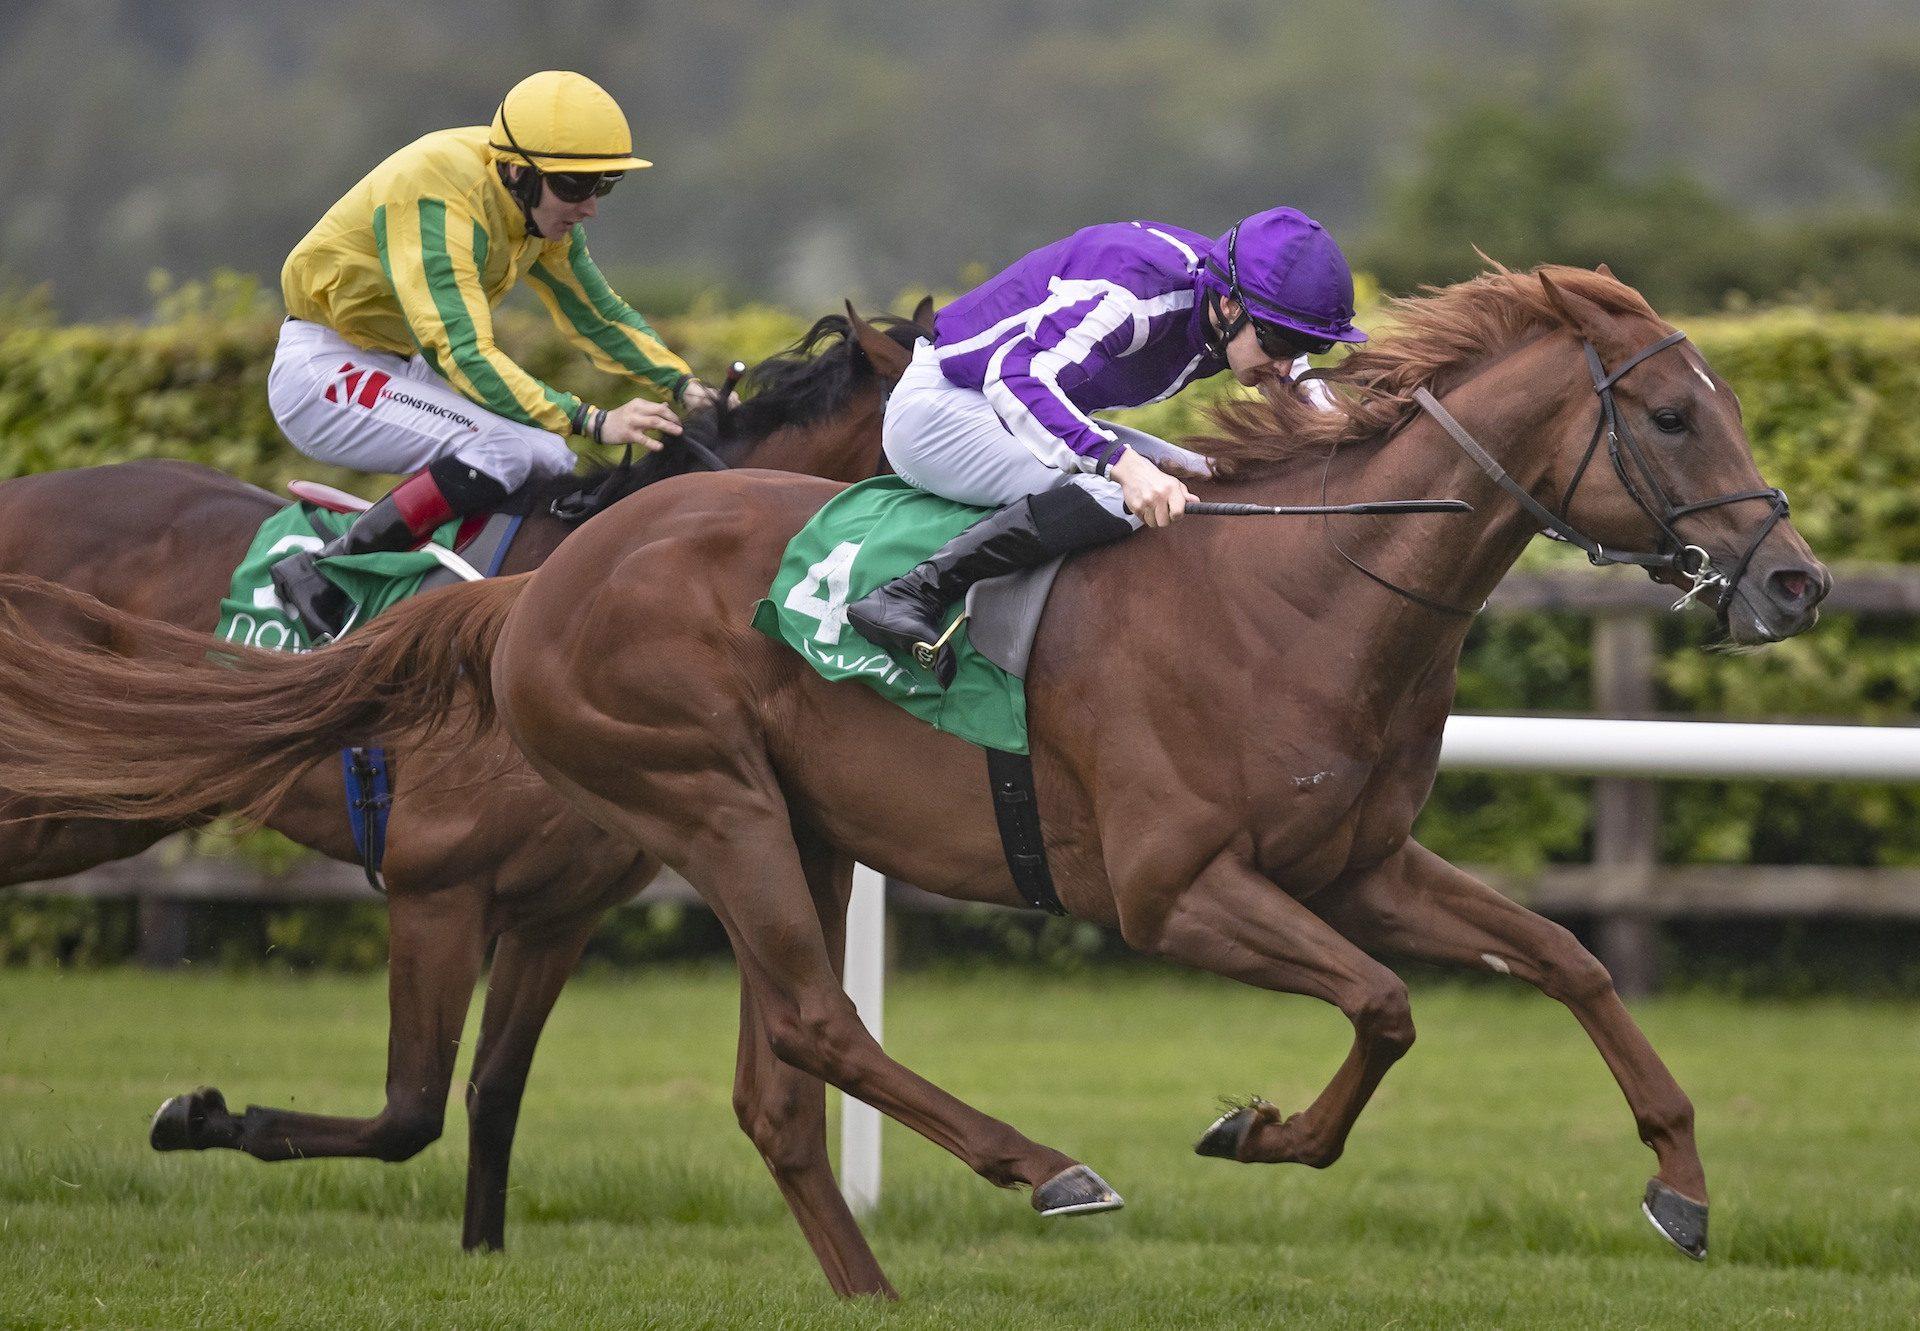 Western Australia (Australia) Wins The Yeats Stakes at Navan